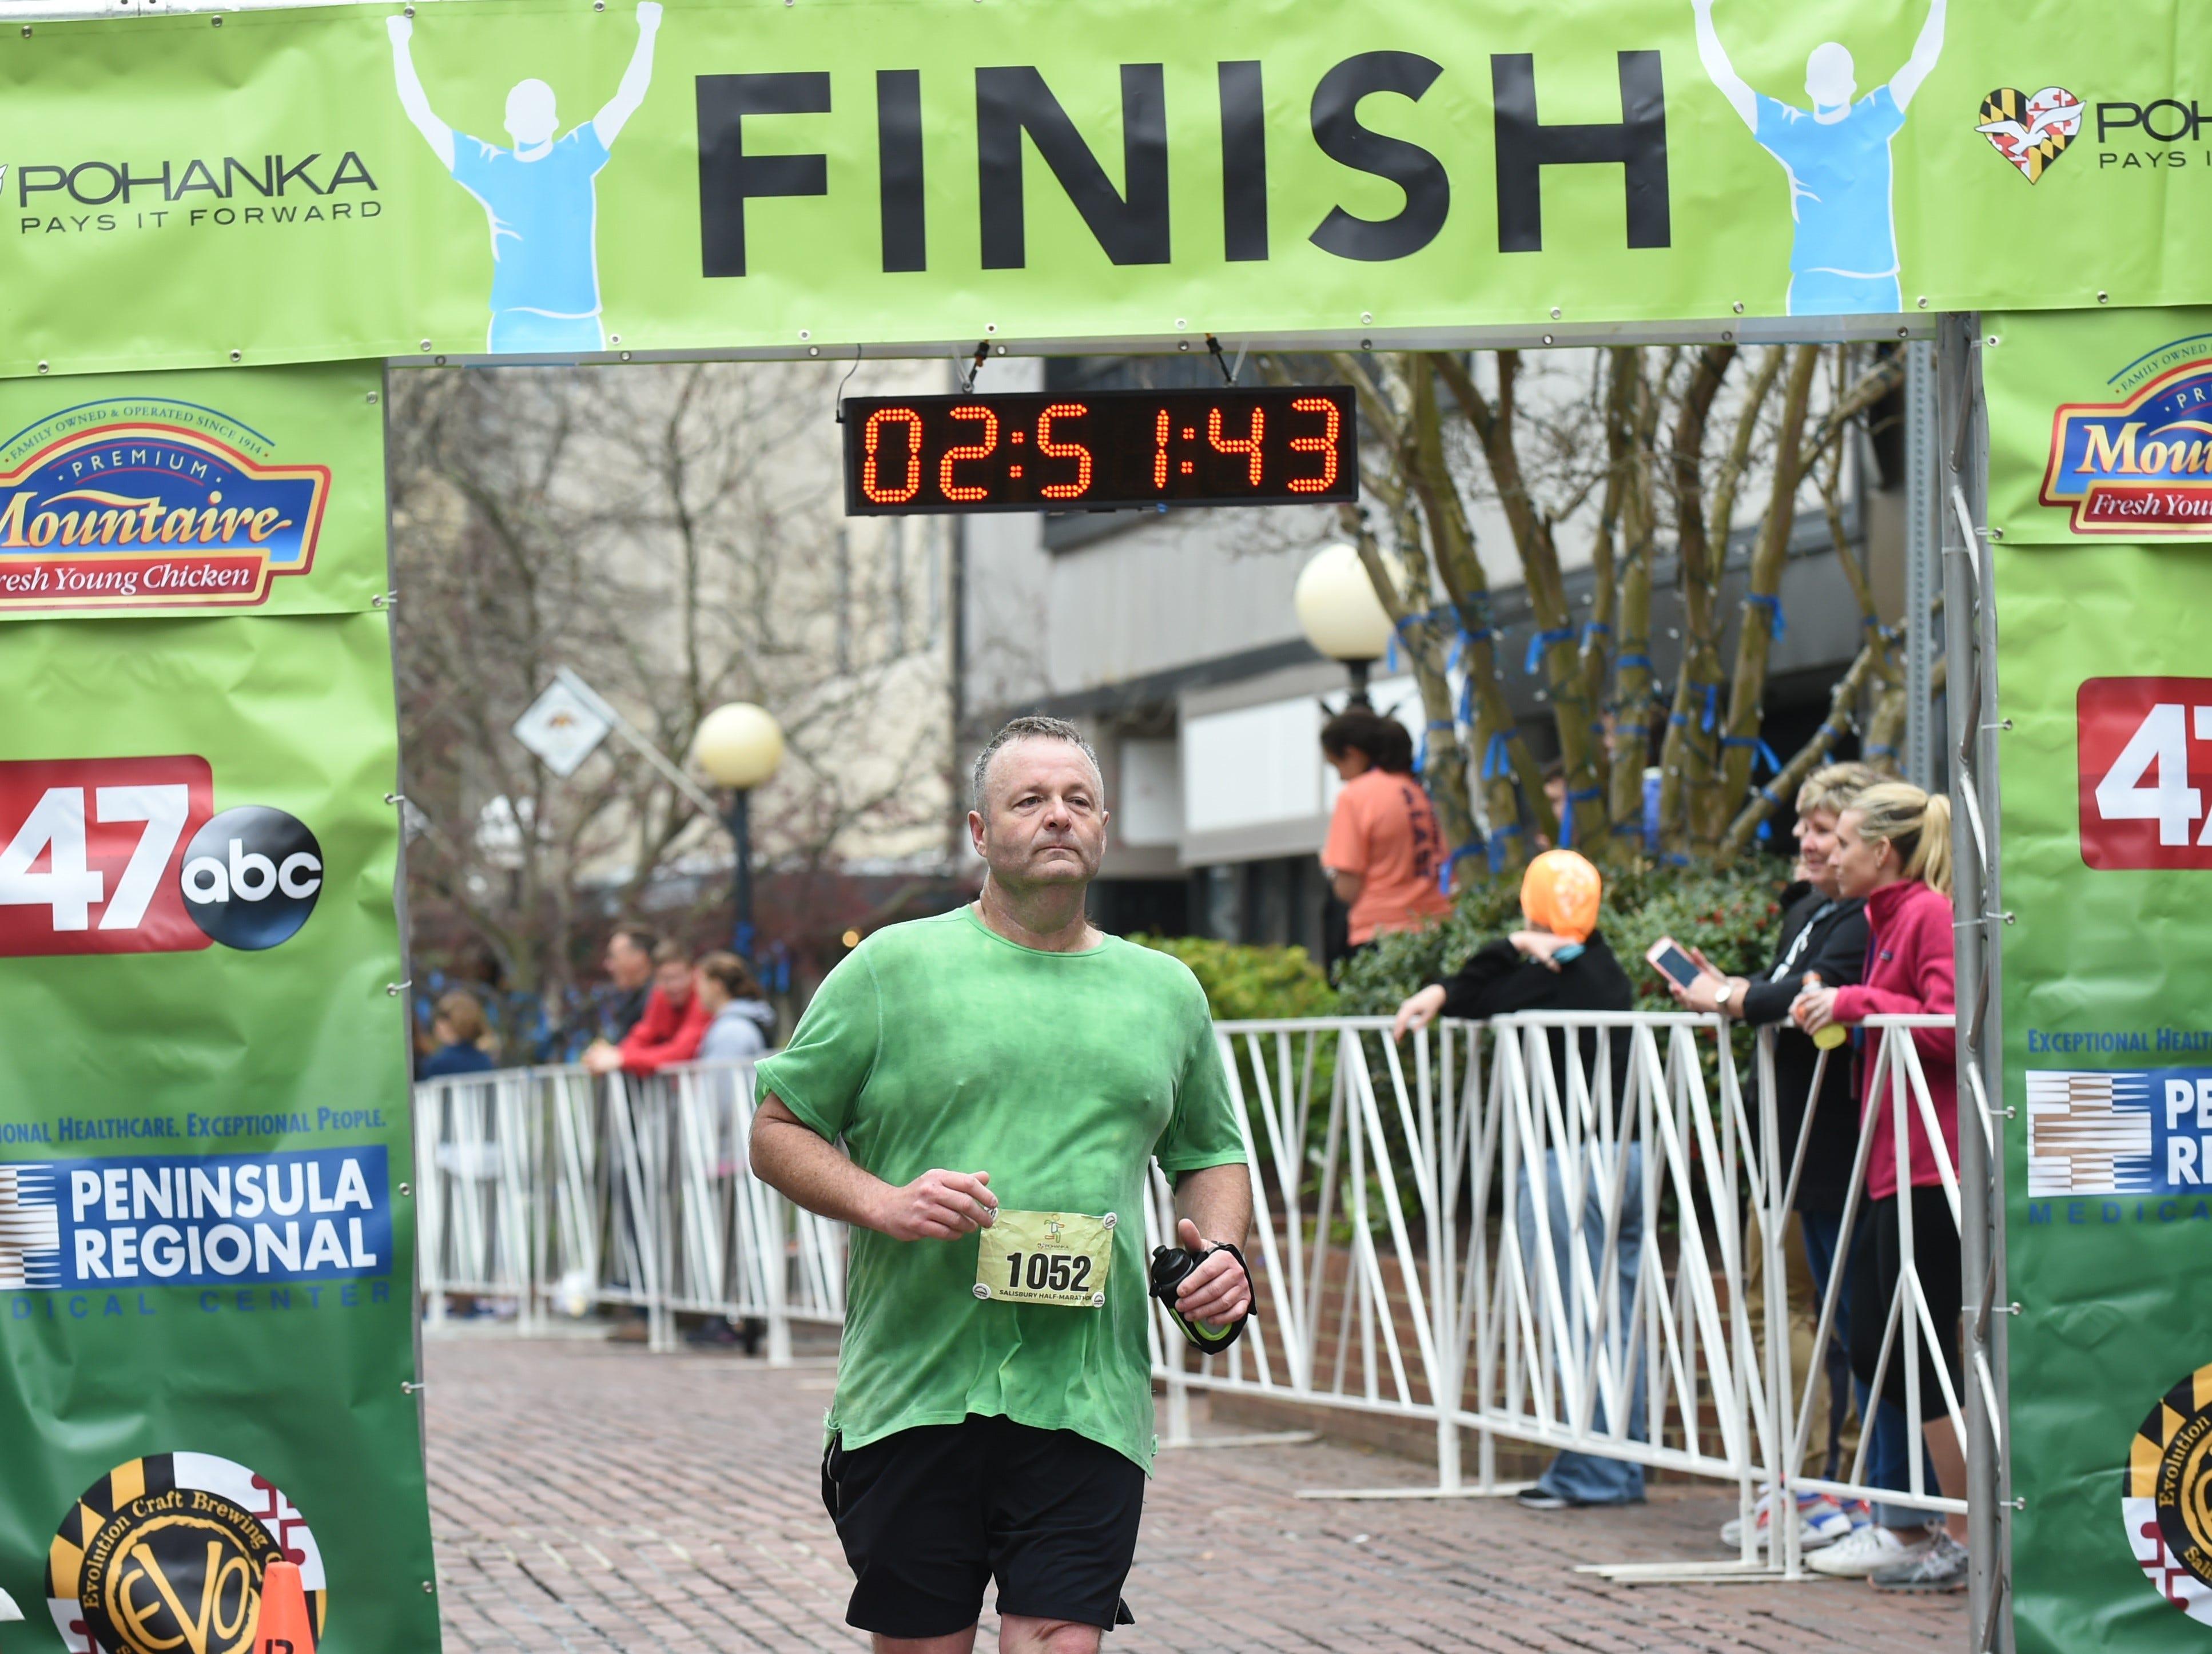 Joseph Andrews crosses the finish line after running in the 2nd Salisbury Marathon/ Half Marathon/ 5k.